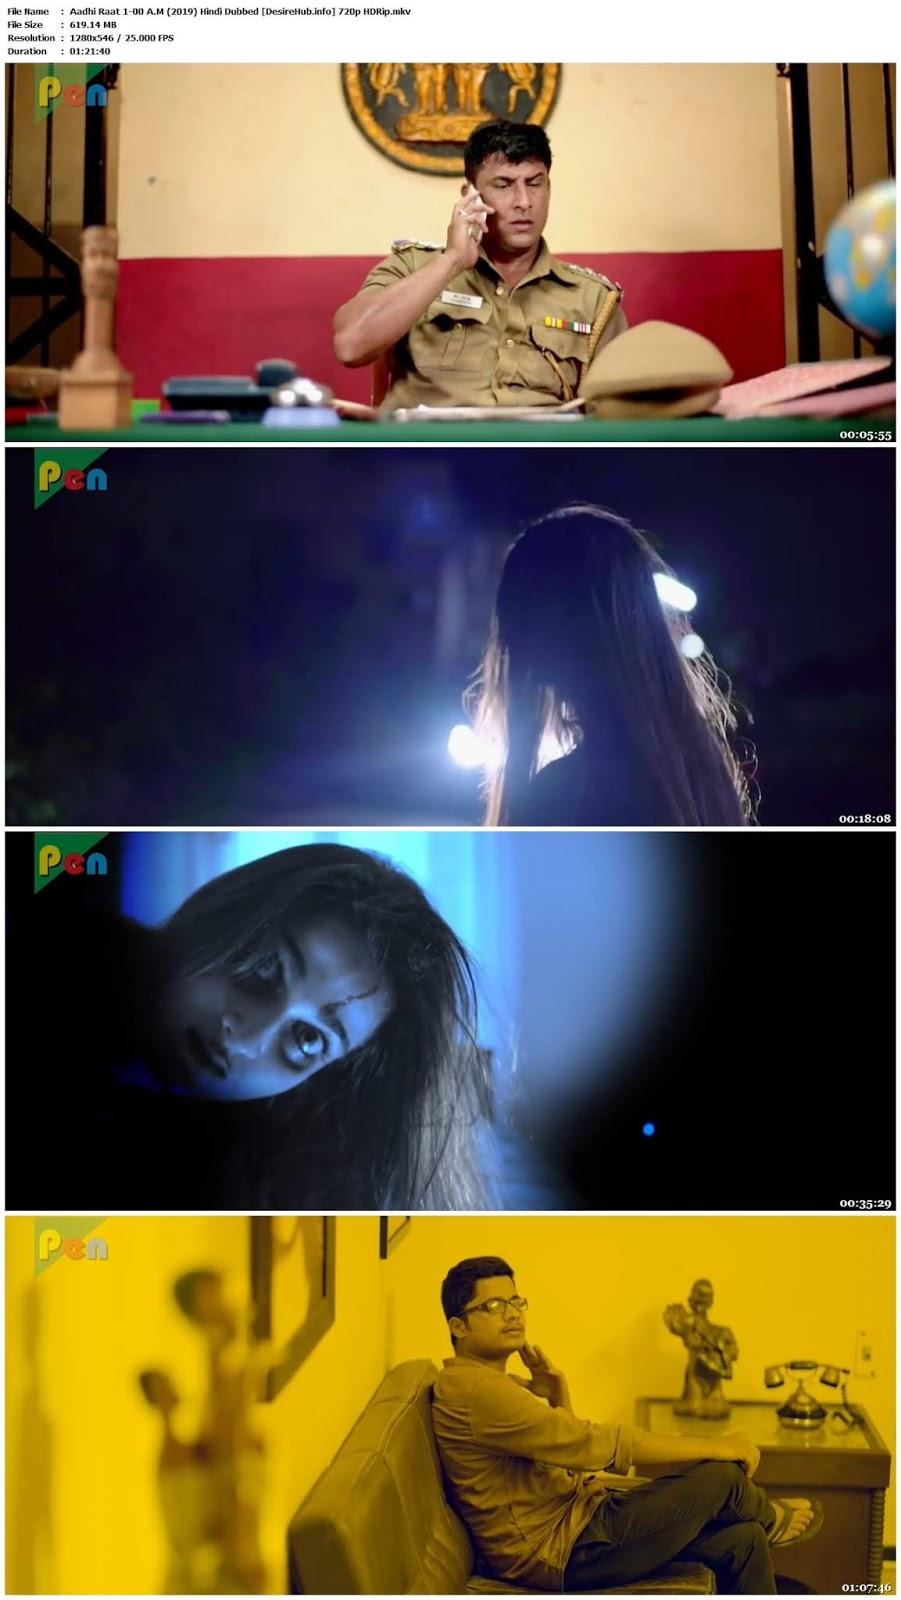 Aadhi Raat 1:00 A.M (2019) Hindi Dubbed 480p HDRip 250MB Desirehub